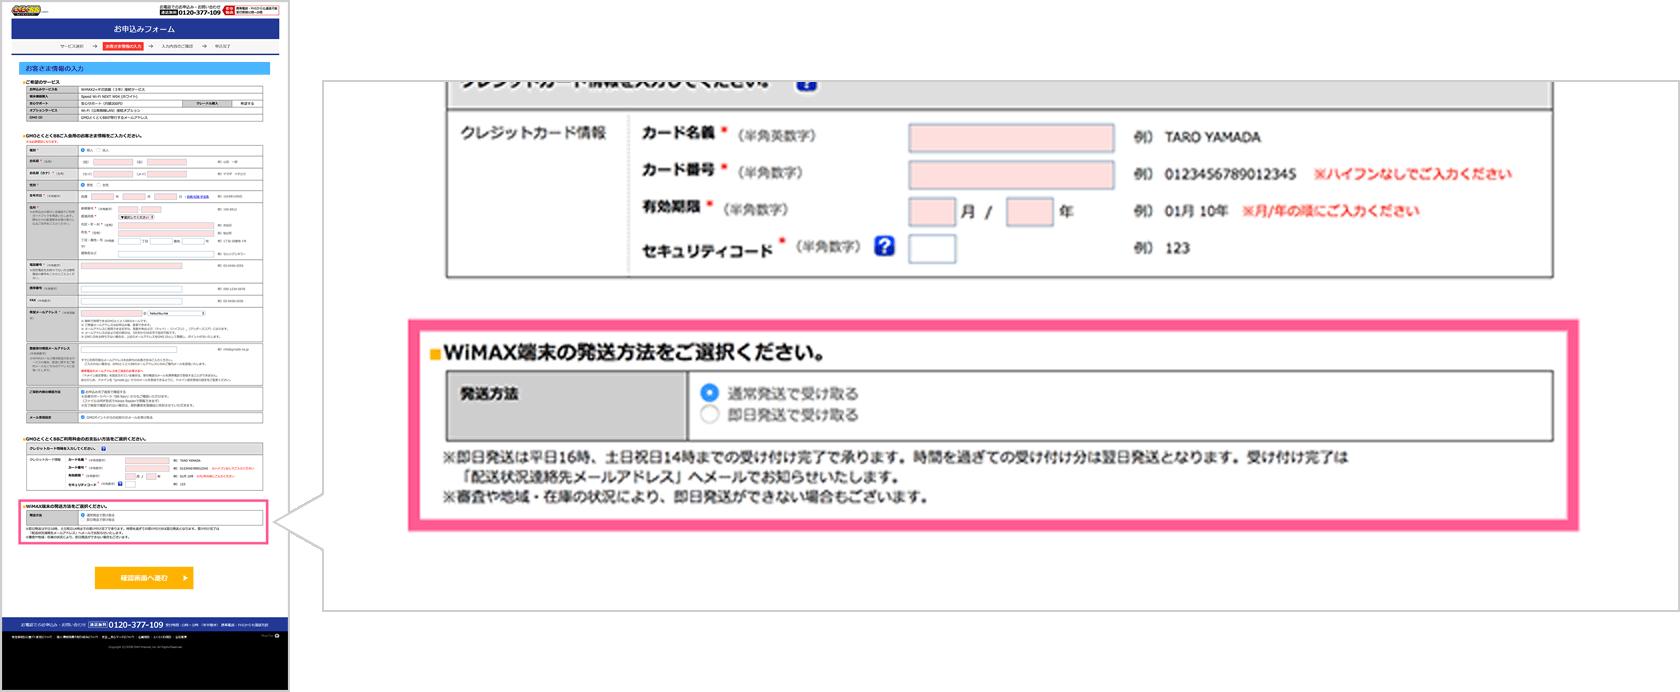 GMOとくとくBB_契約画面_即日発送